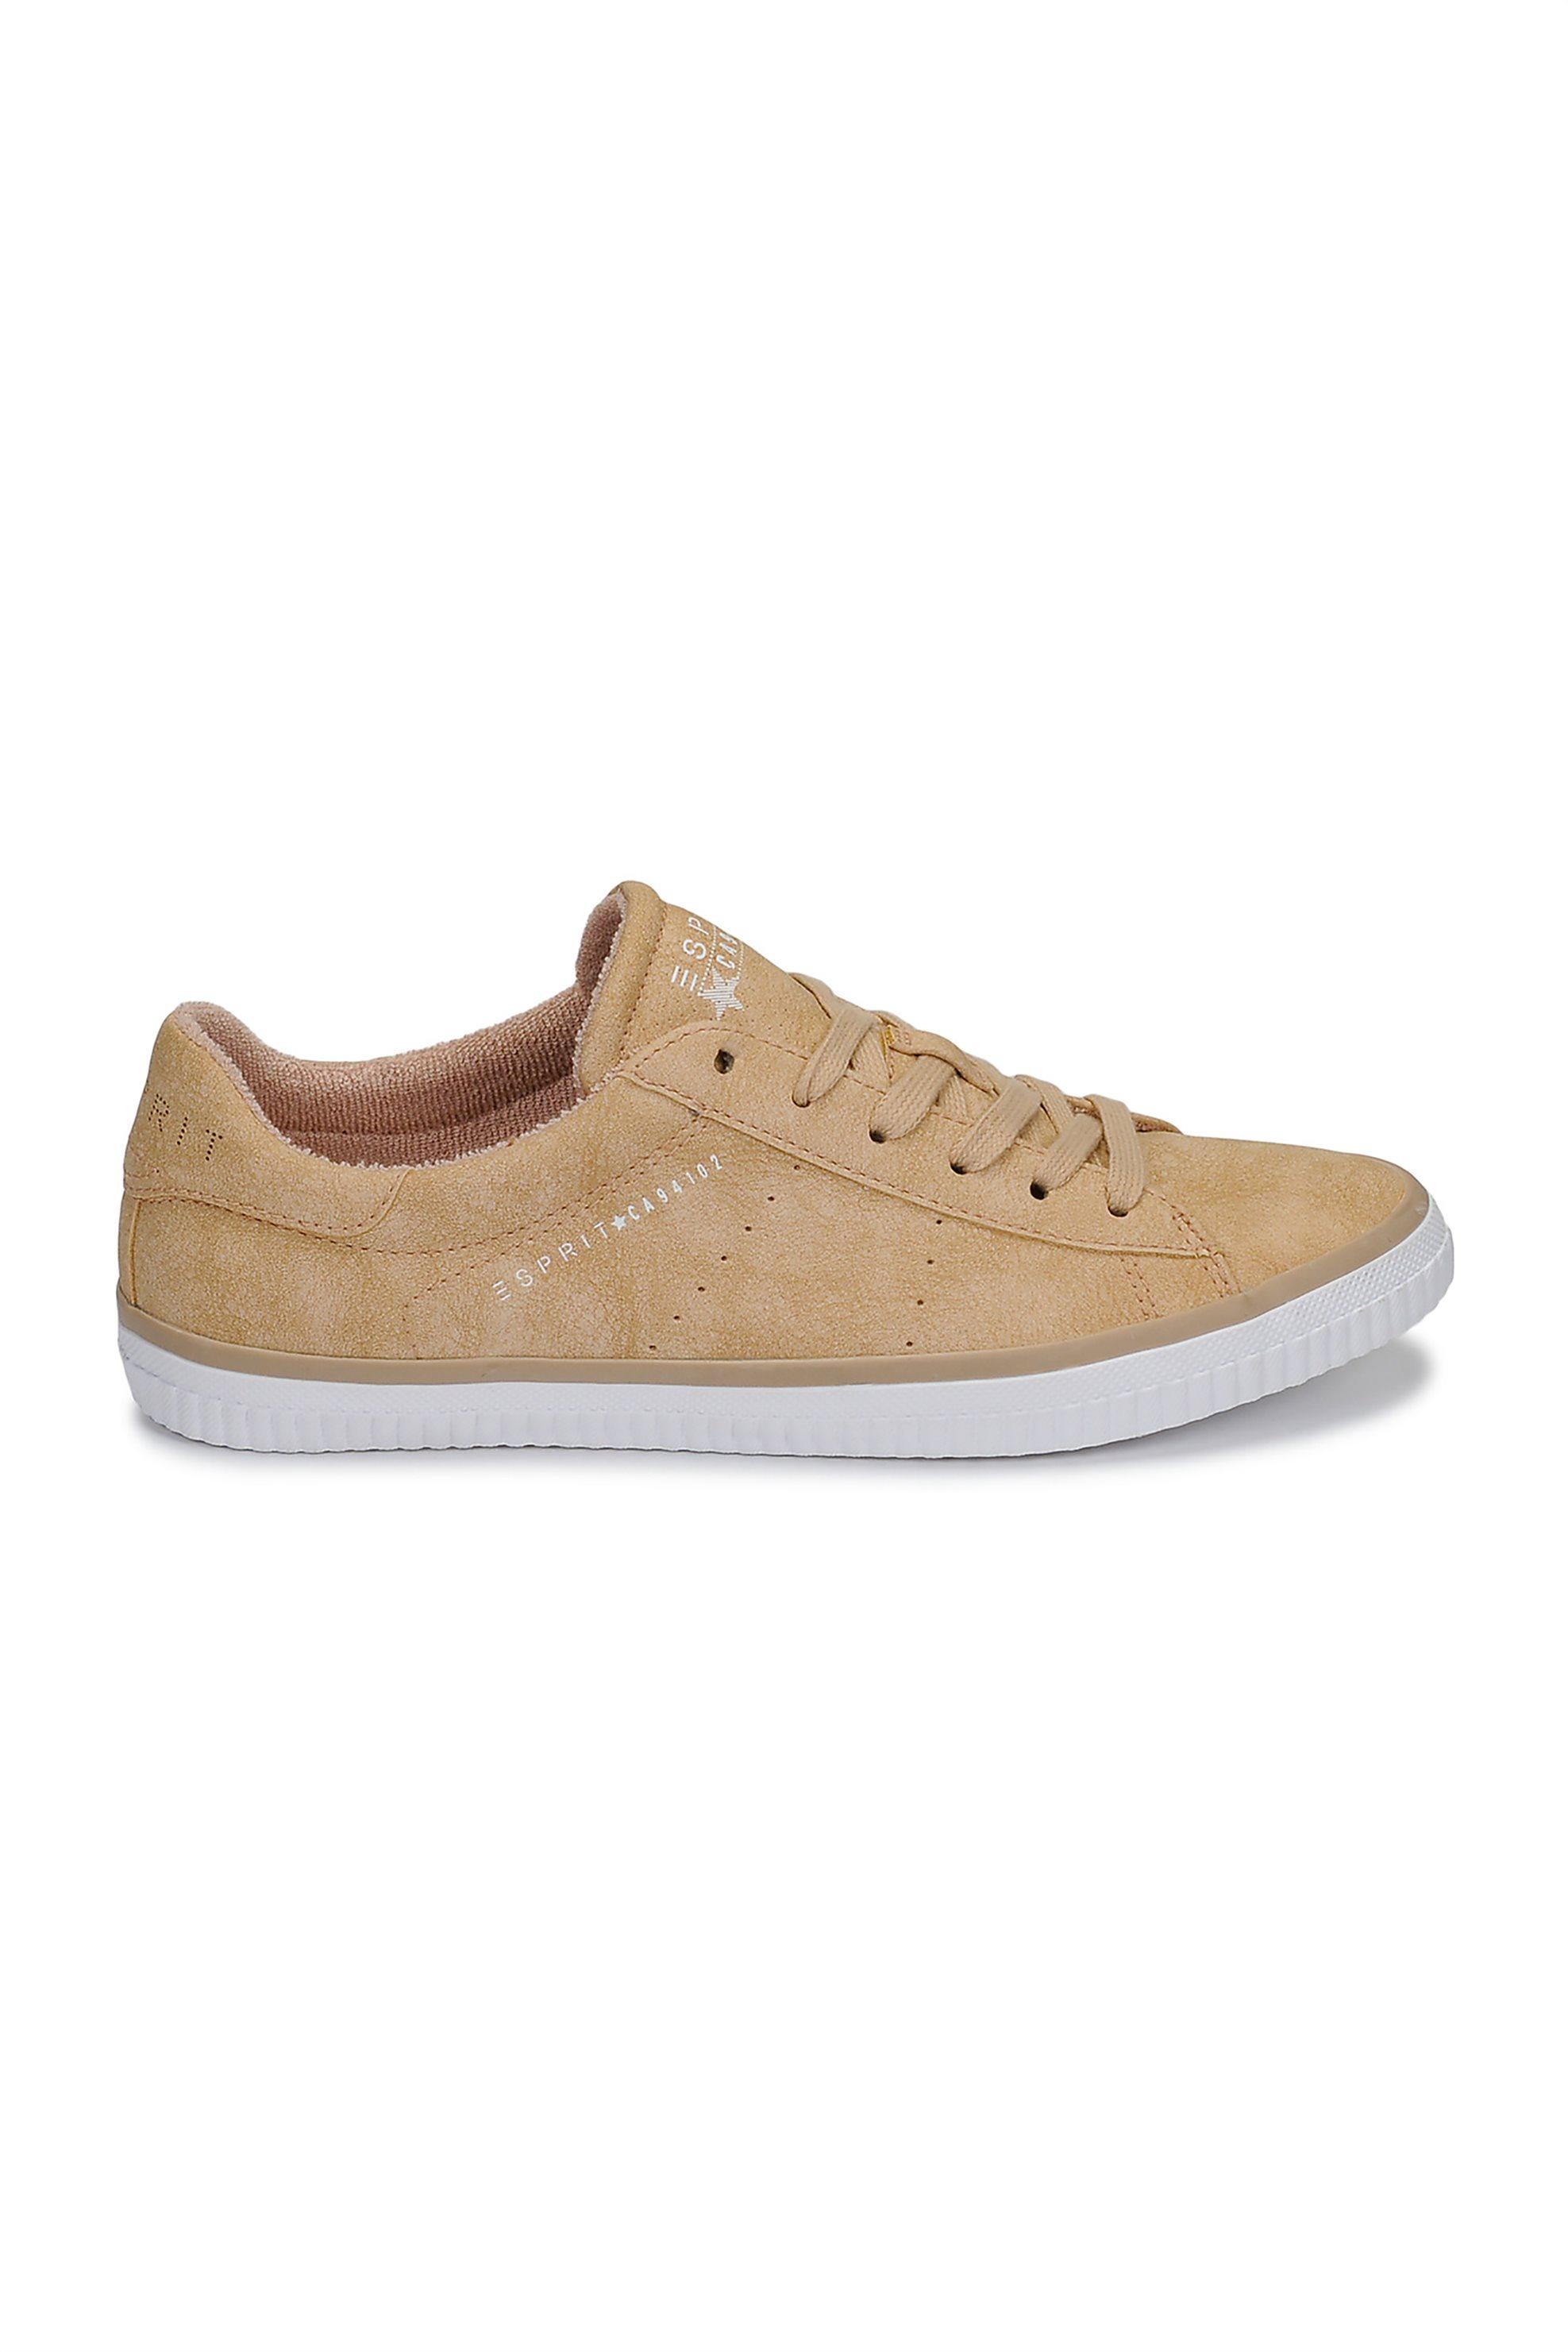 04705198fb8 Παπούτσια ESPRIT - ONA shoes